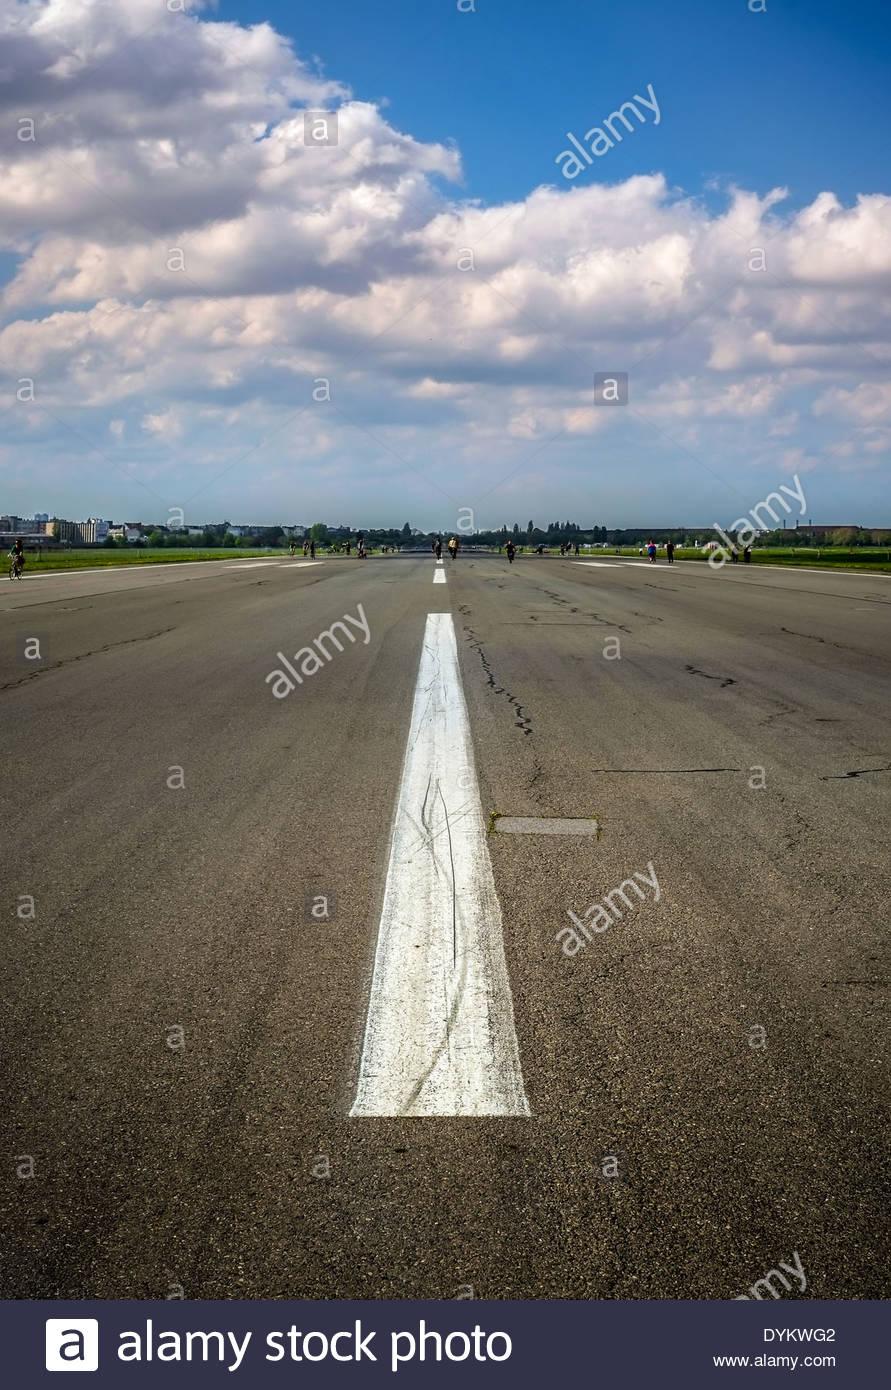 Airfield Tempelhof Berlin, Germany - Stock Image